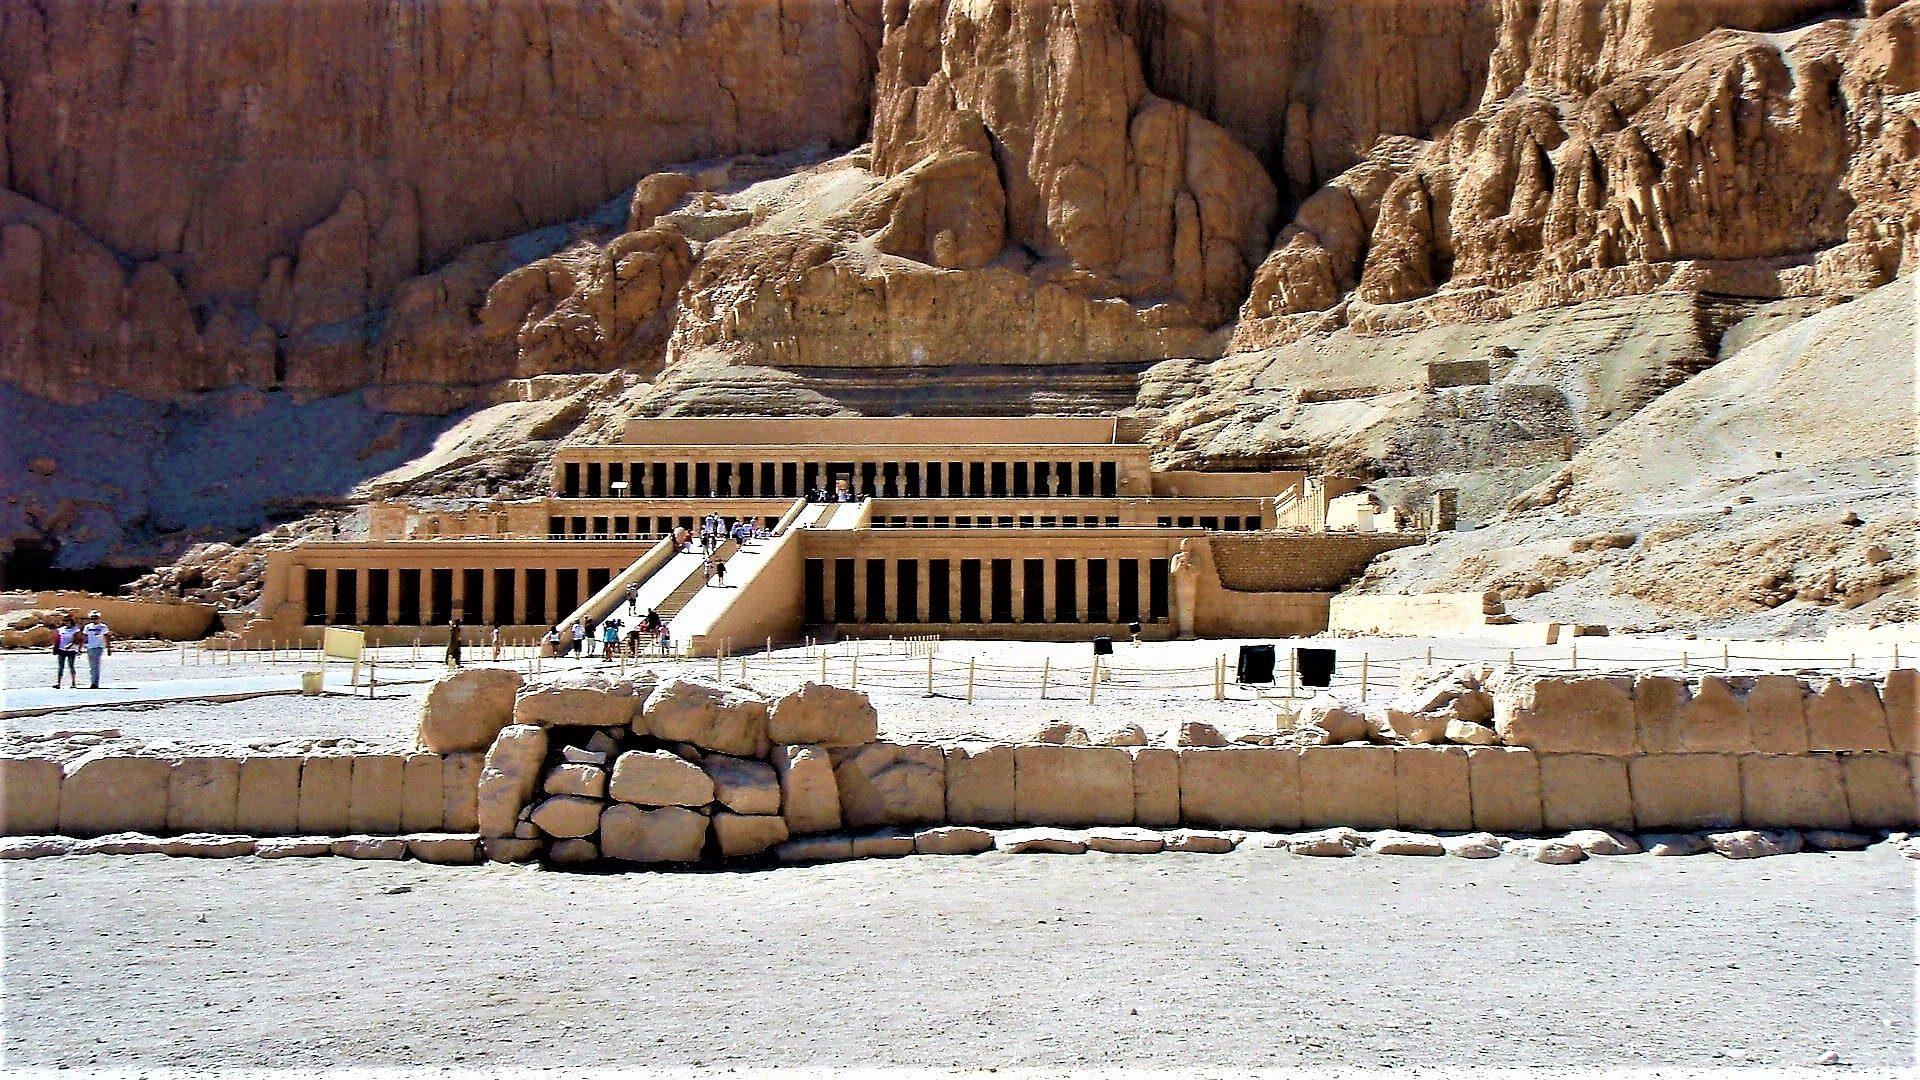 Templo de, Arqueologia, ruínas, antepassados, Hatshepsut, Luxor - Papéis de parede HD - Professor-falken.com